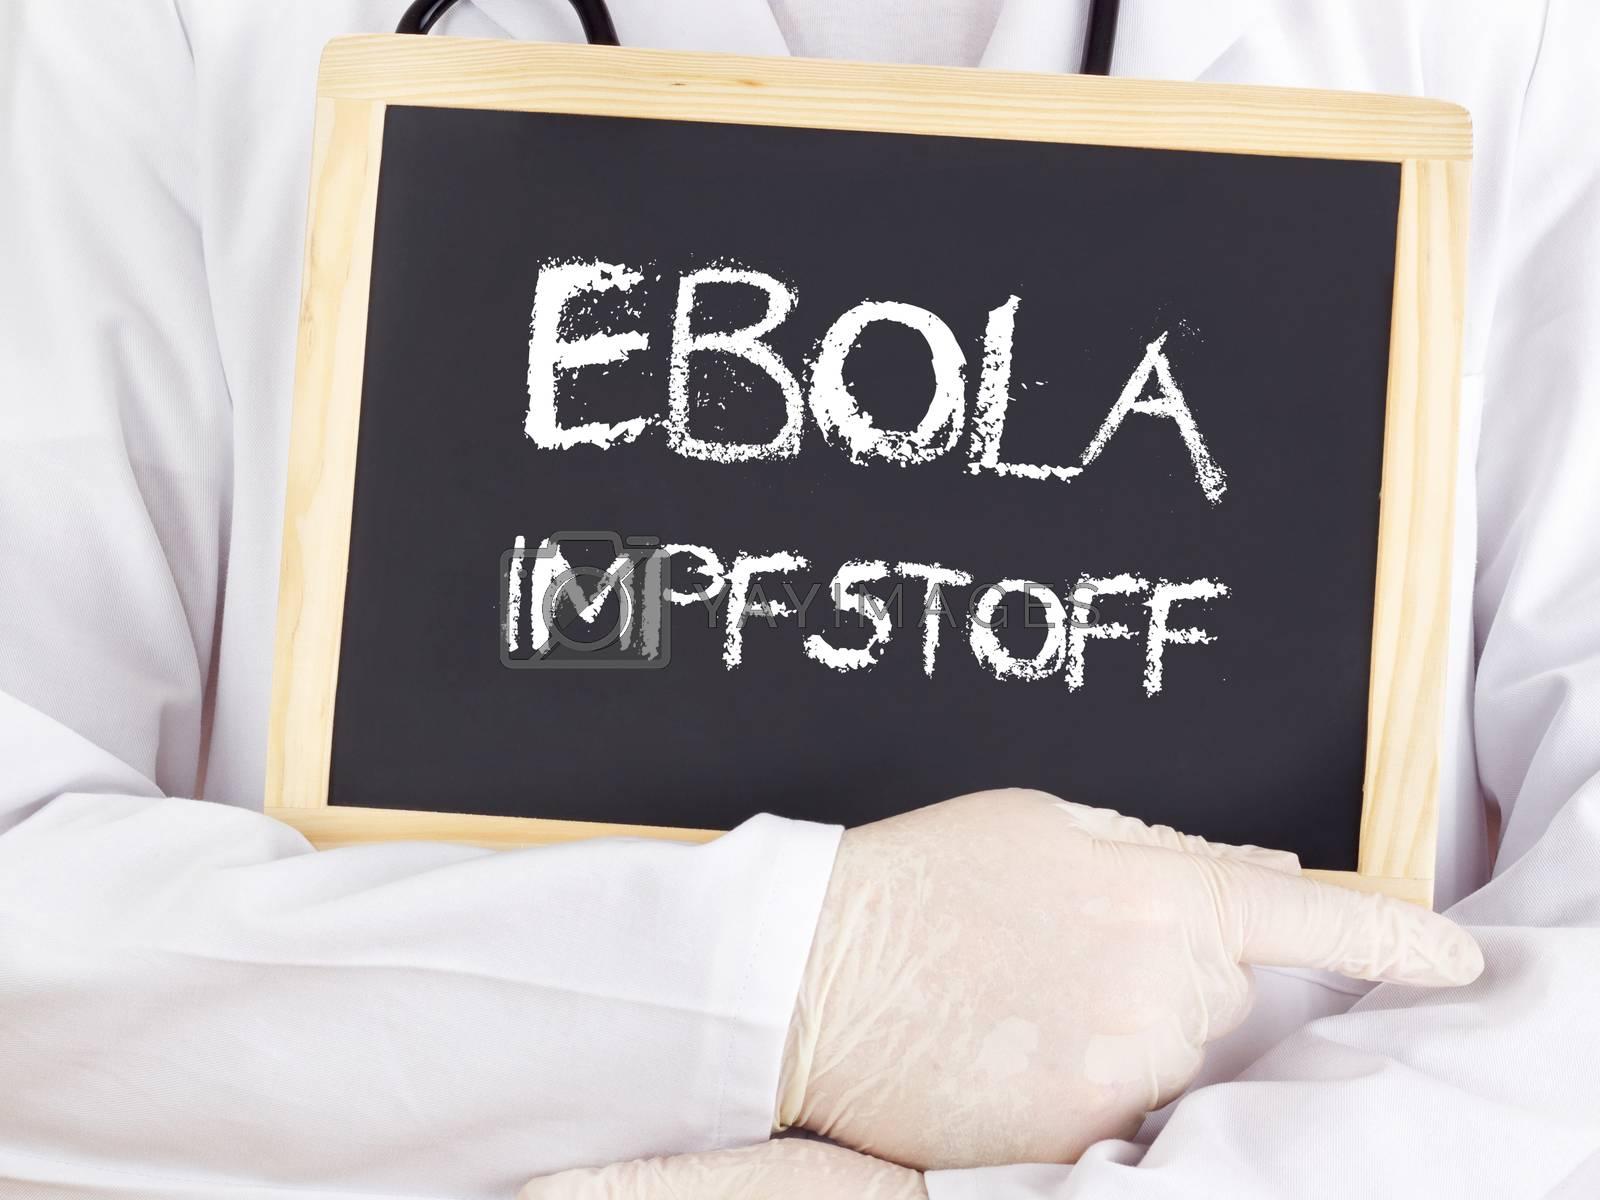 Doctor shows information: Ebola serum in german language